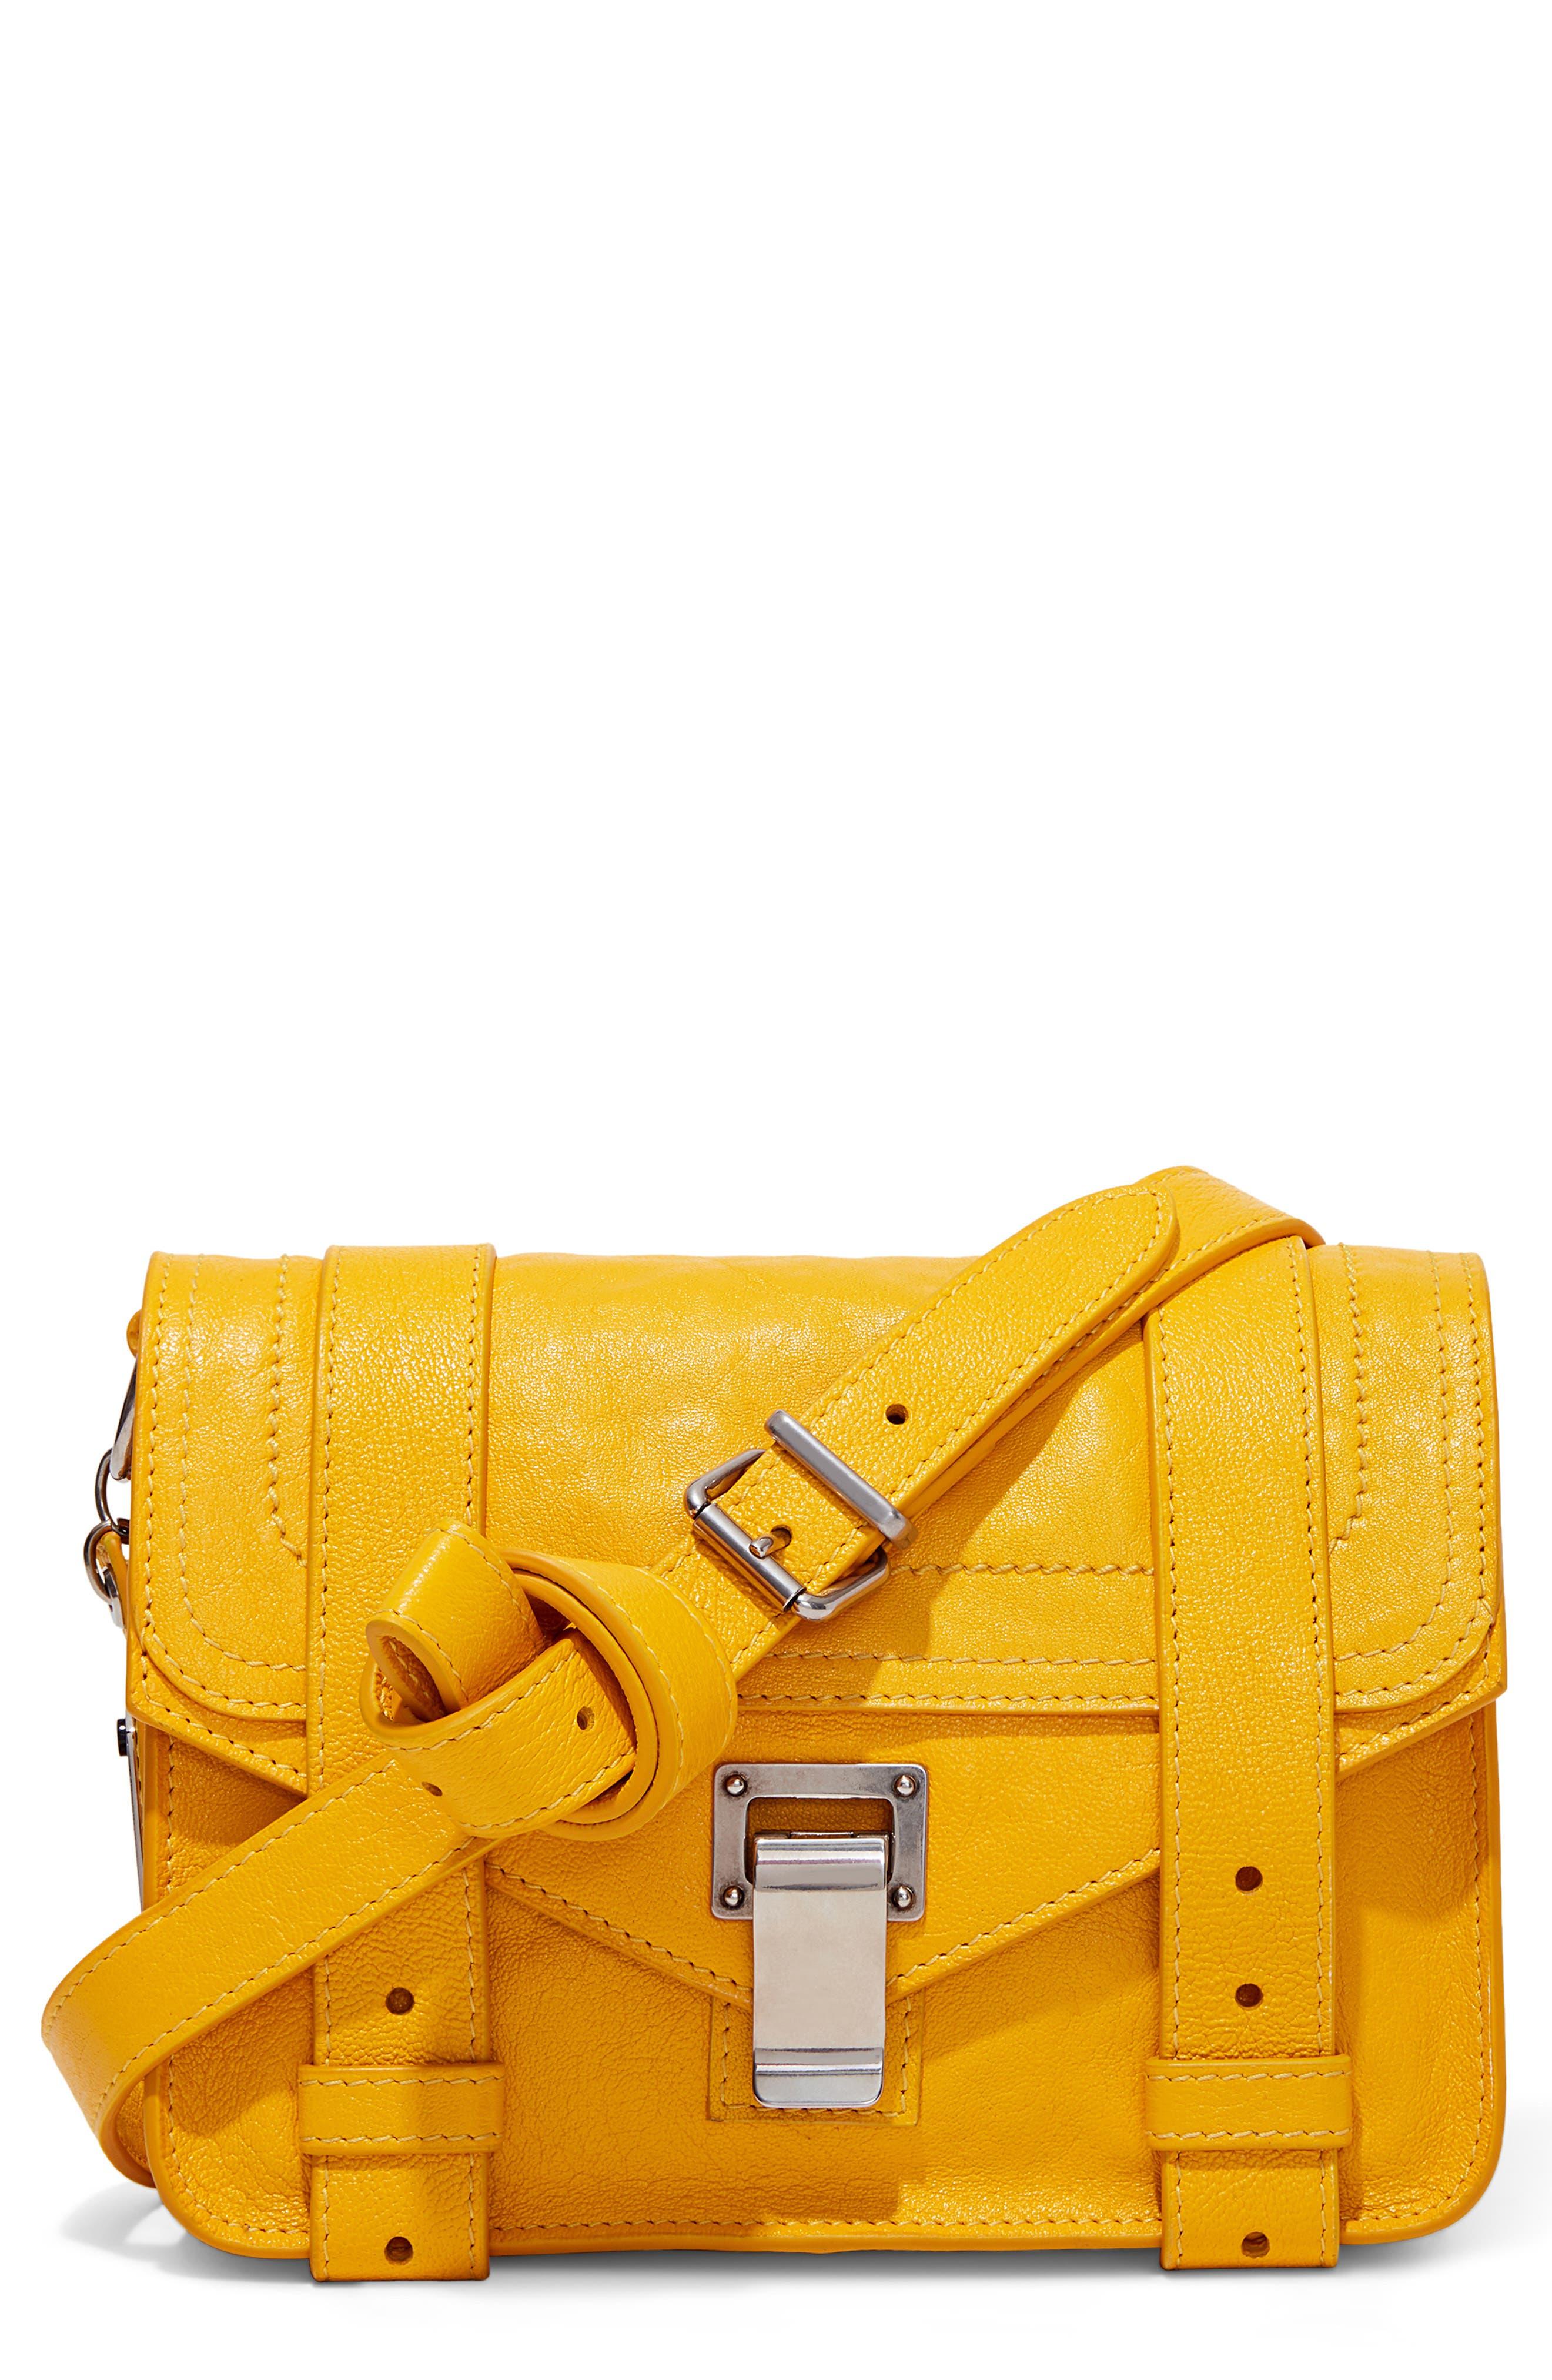 'mini Ps1' Lambskin Leather Crossbody Bag by Proenza Schouler